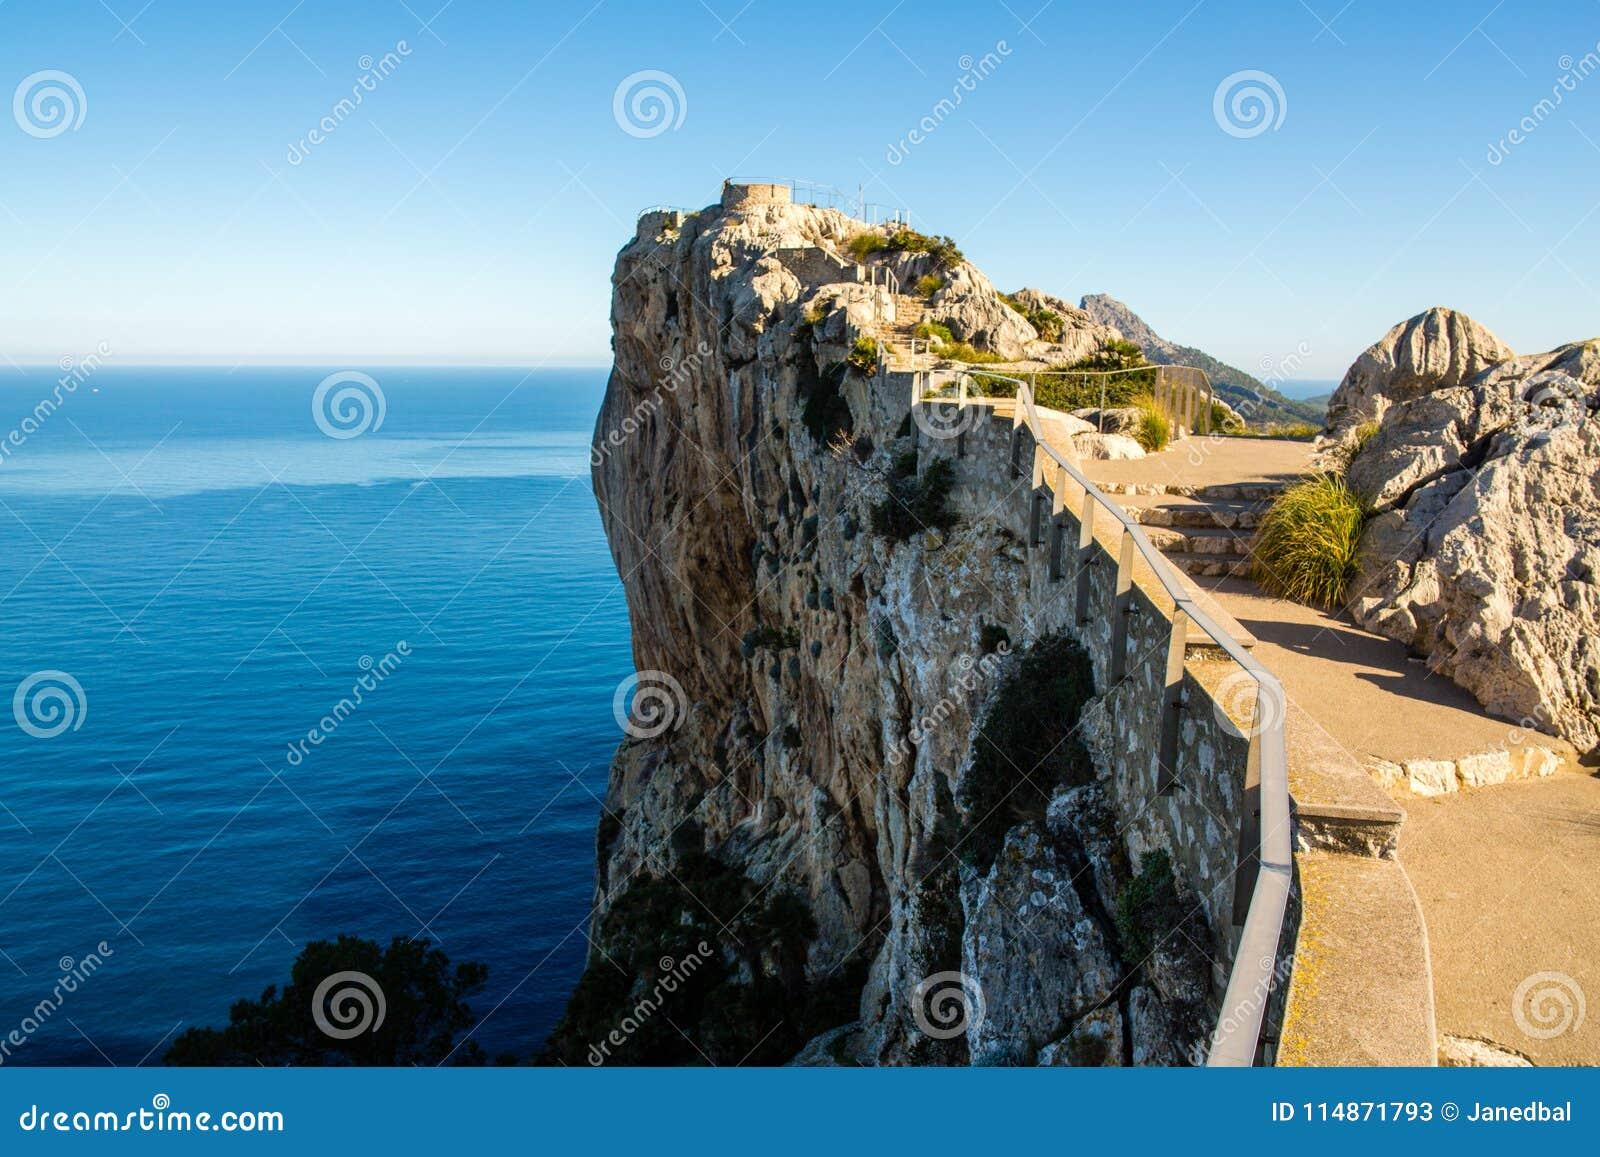 Mirador Es Colomer cliff on a sunny day, Majorca, Spain